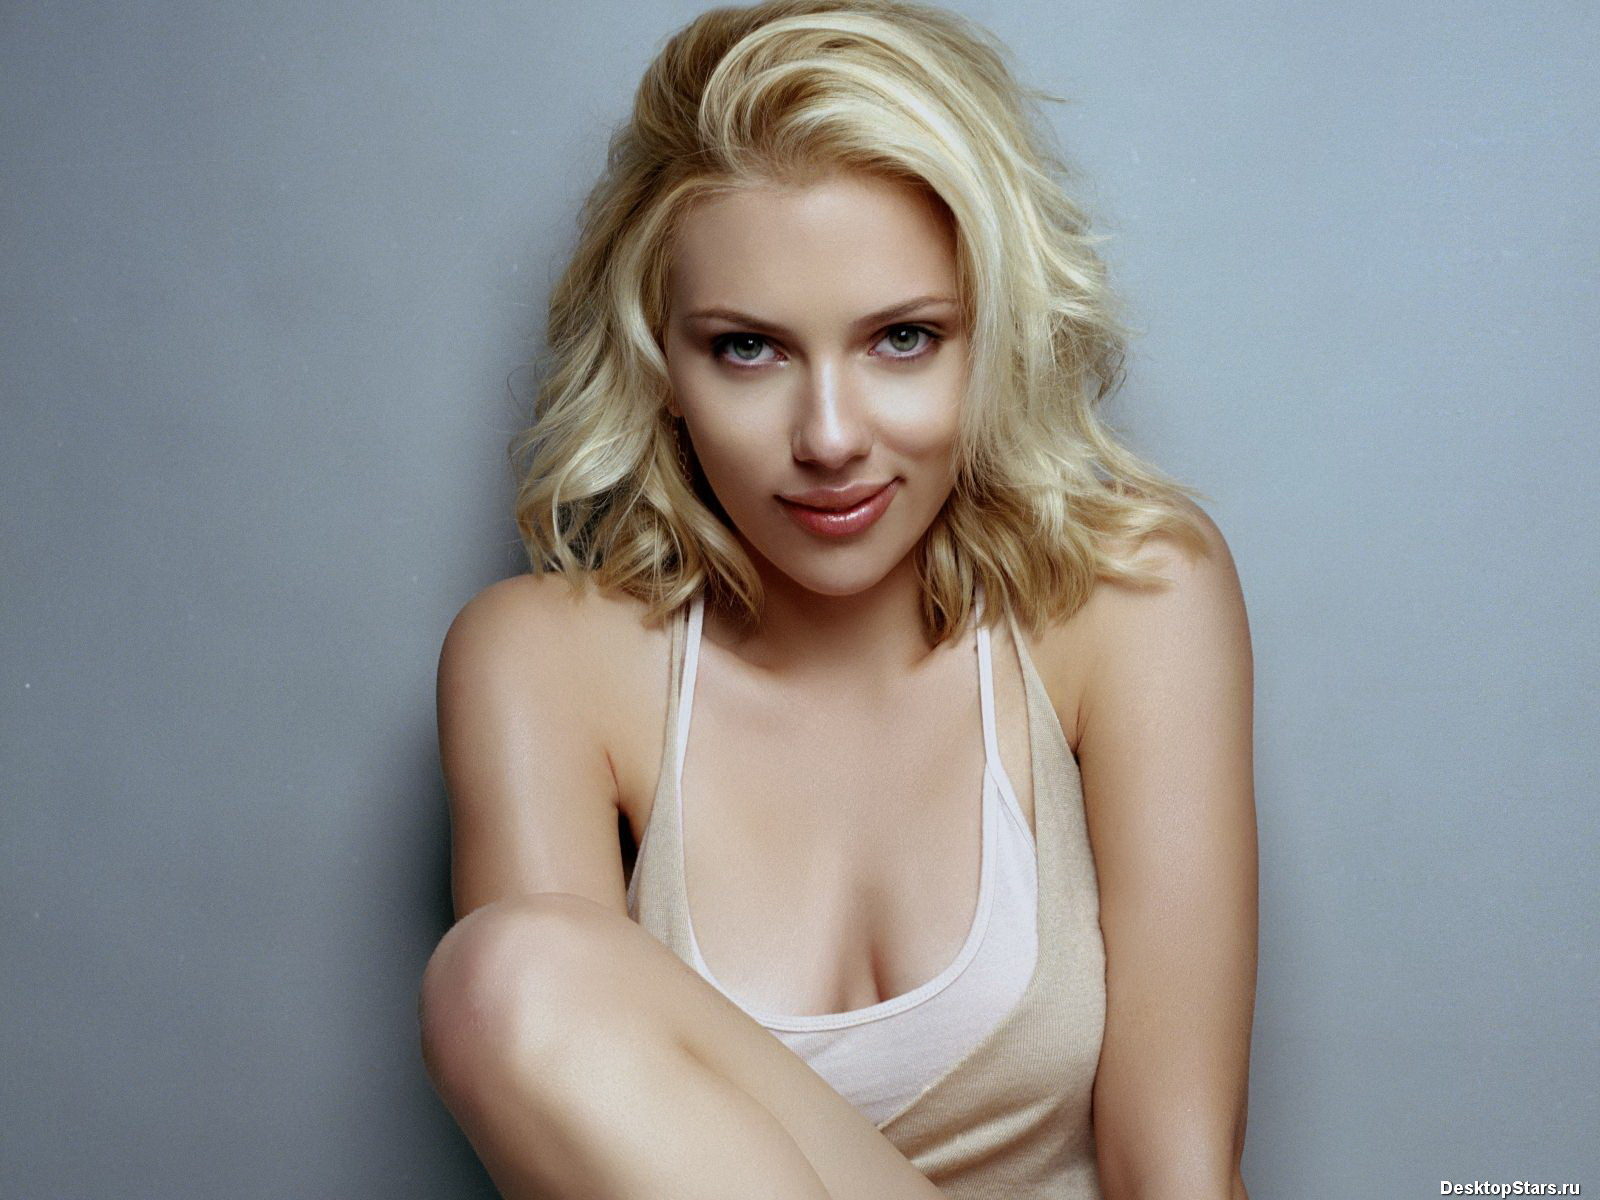 http://4.bp.blogspot.com/_7HNAy3_ifGg/TAyW10tGeNI/AAAAAAAADfk/Oi4SgOdi0Bk/s1600/Scarlett-Johansson-1600x1200-003.jpg